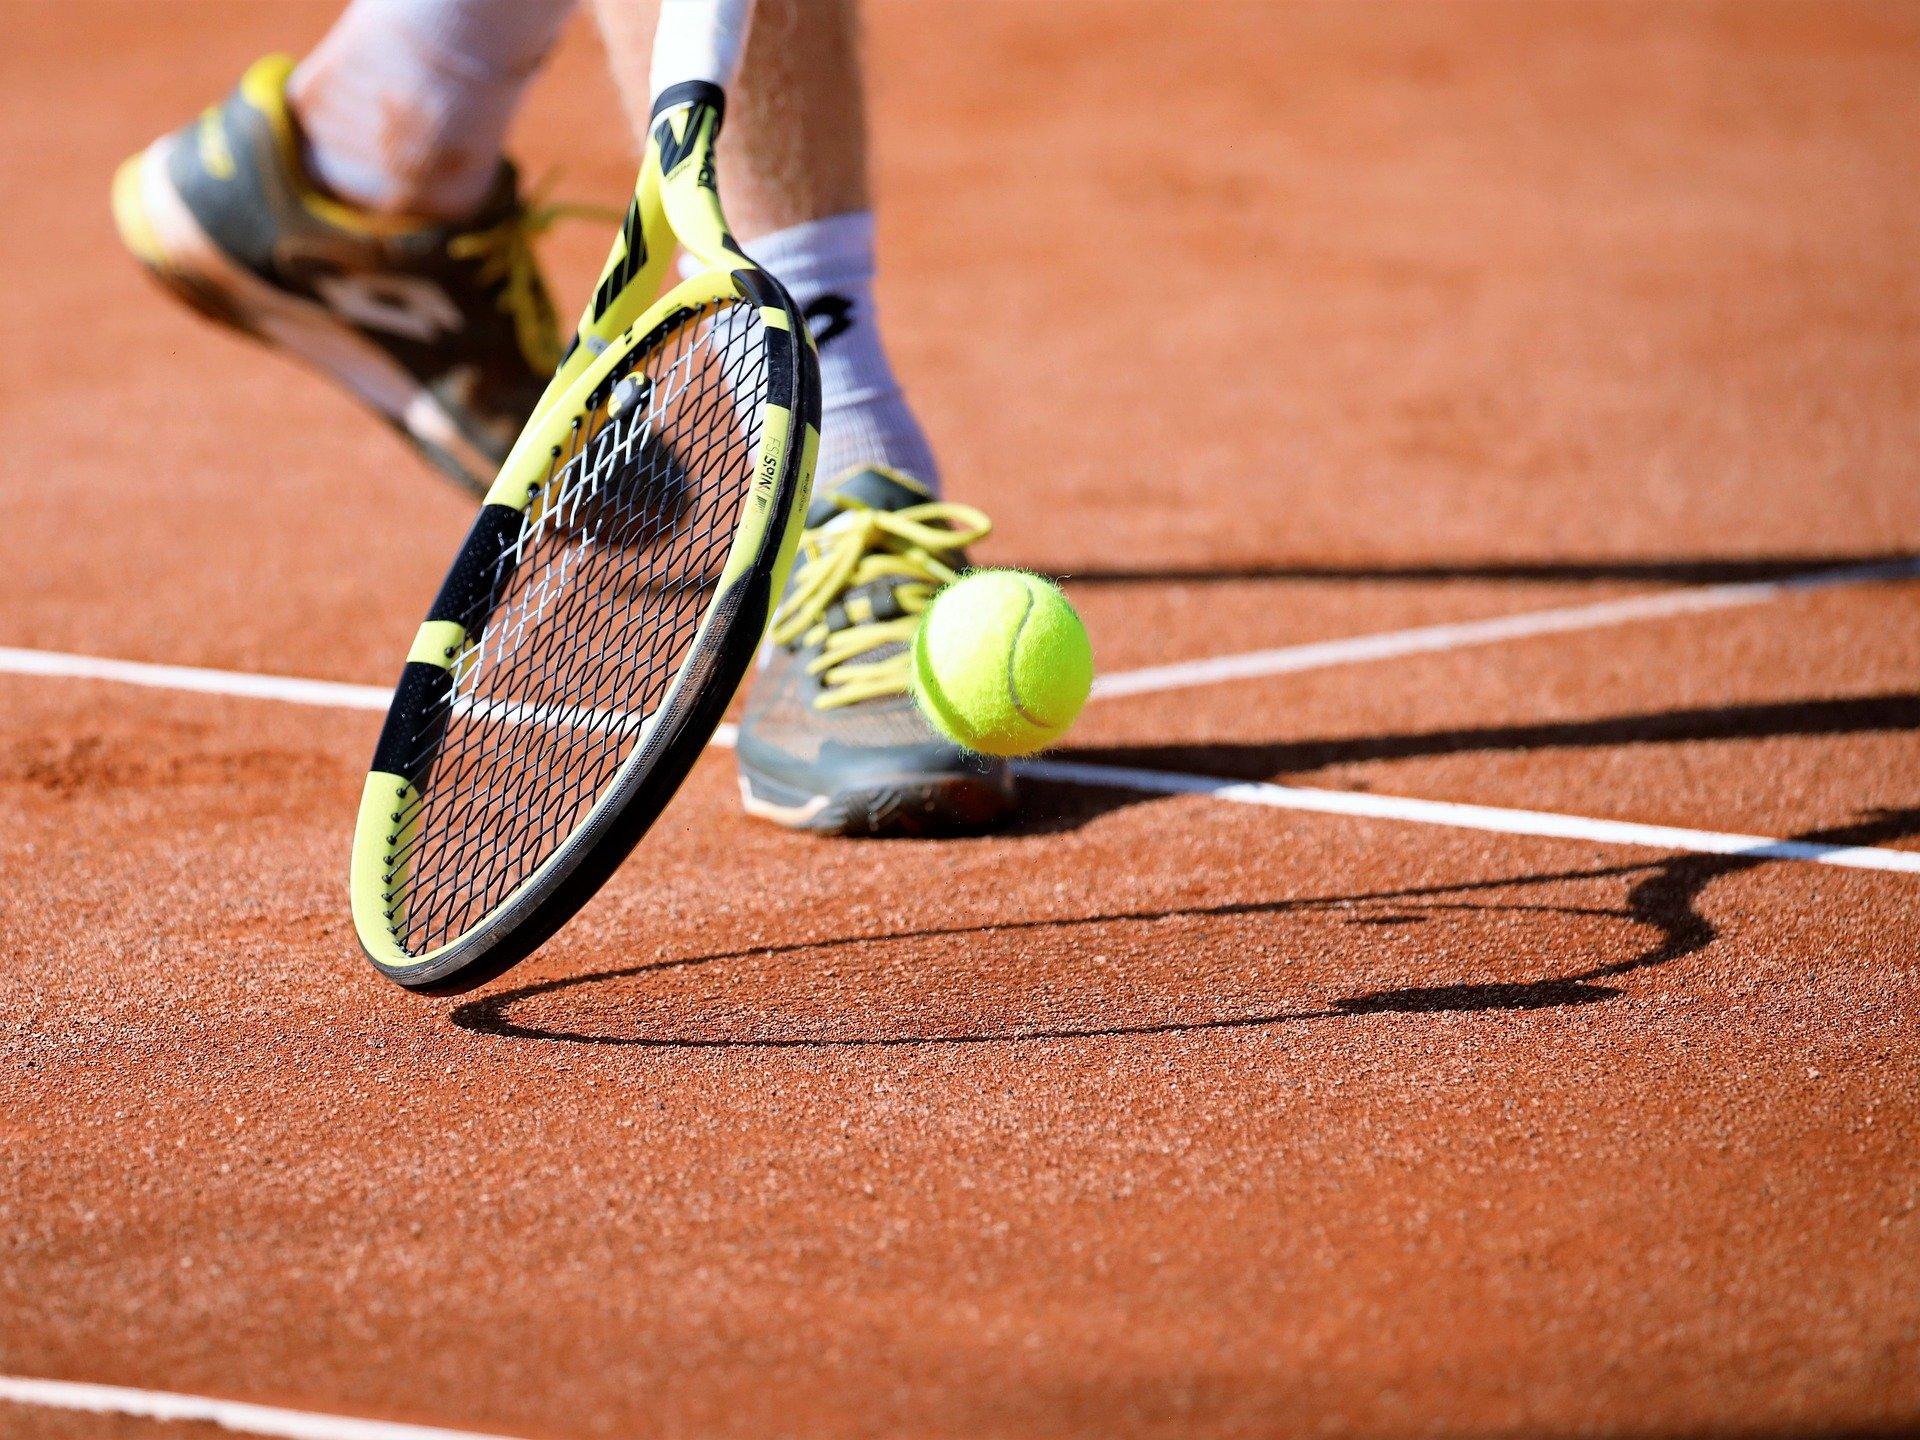 Persona golpeando pelota de tenis con raqueta